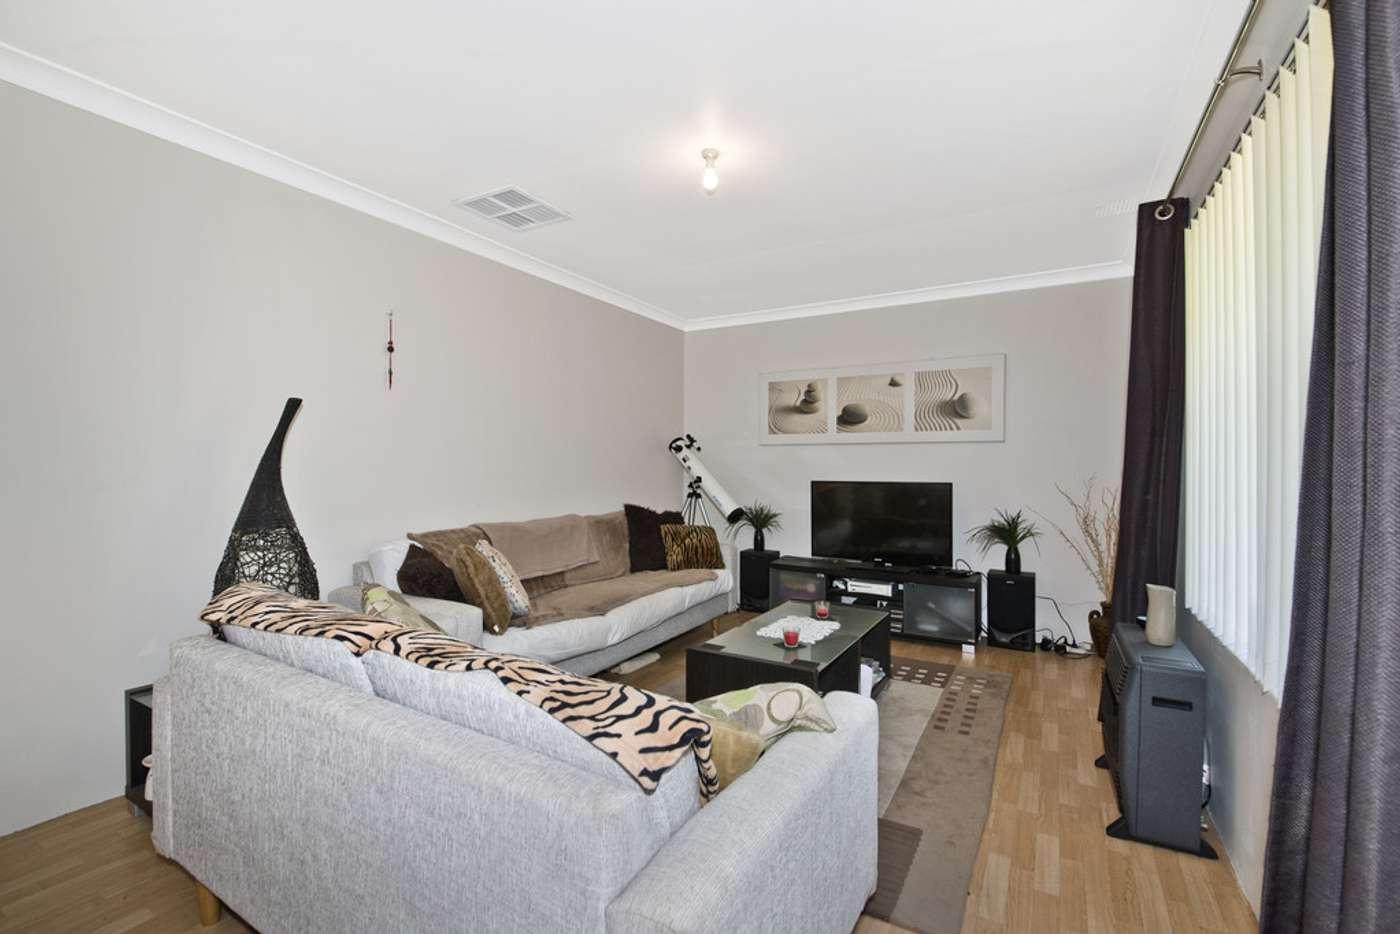 Sixth view of Homely house listing, 45 Kingsbridge Road, Warnbro WA 6169